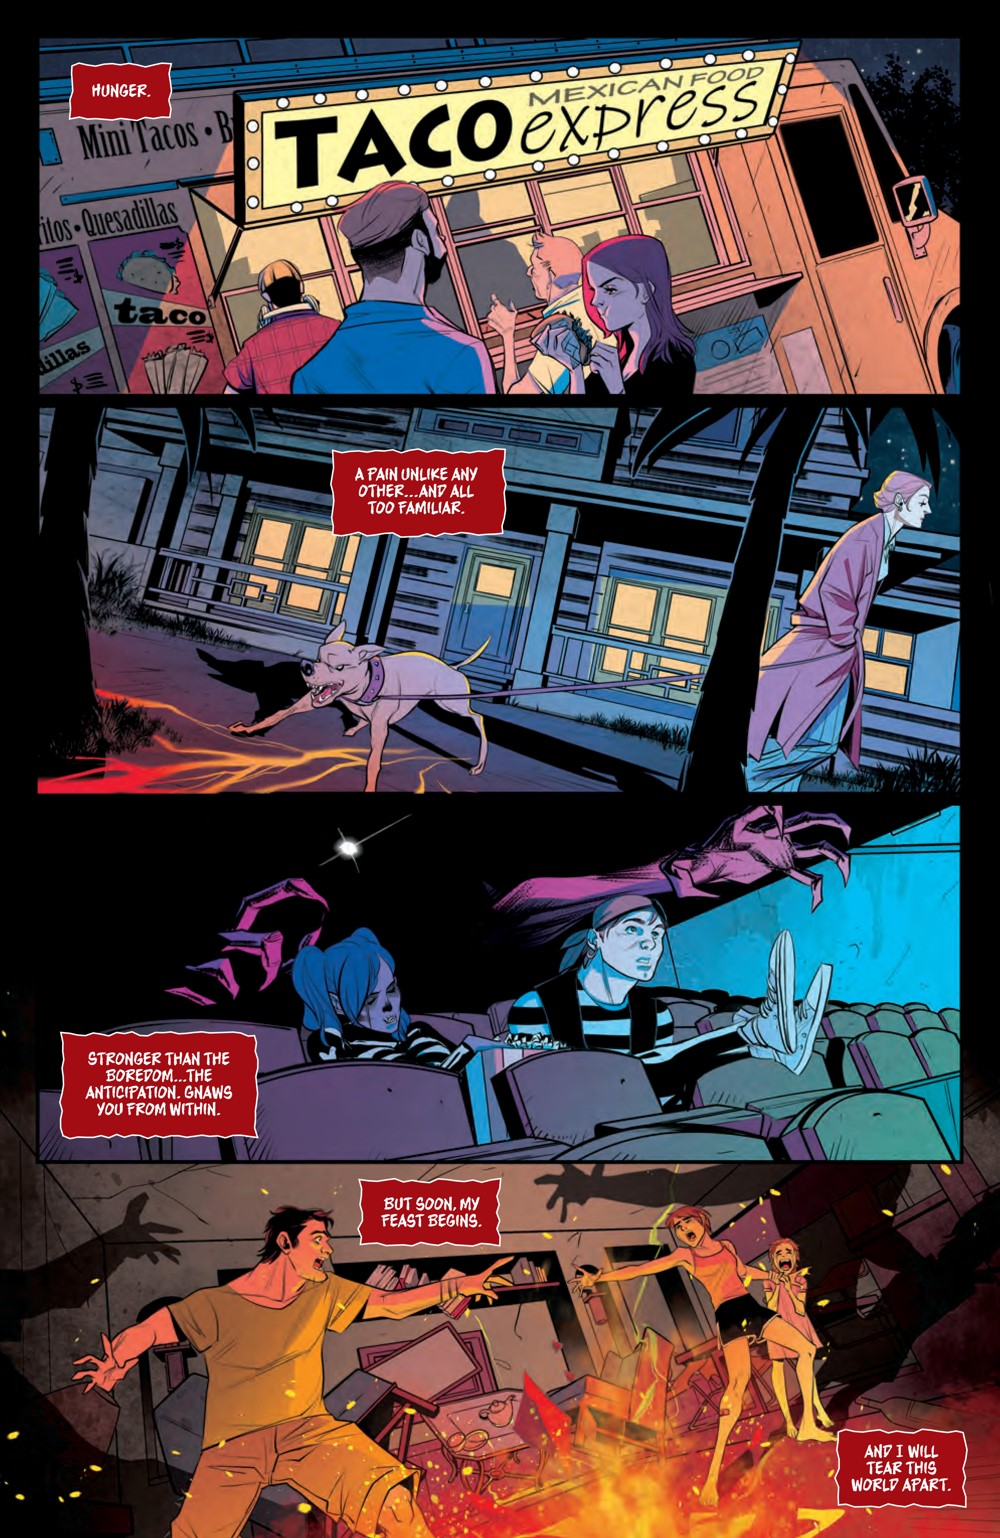 Hellmouth_SC_PRESS_7 ComicList Previews: BUFFY THE VAMPIRE SLAYER HELLMOUTH TP